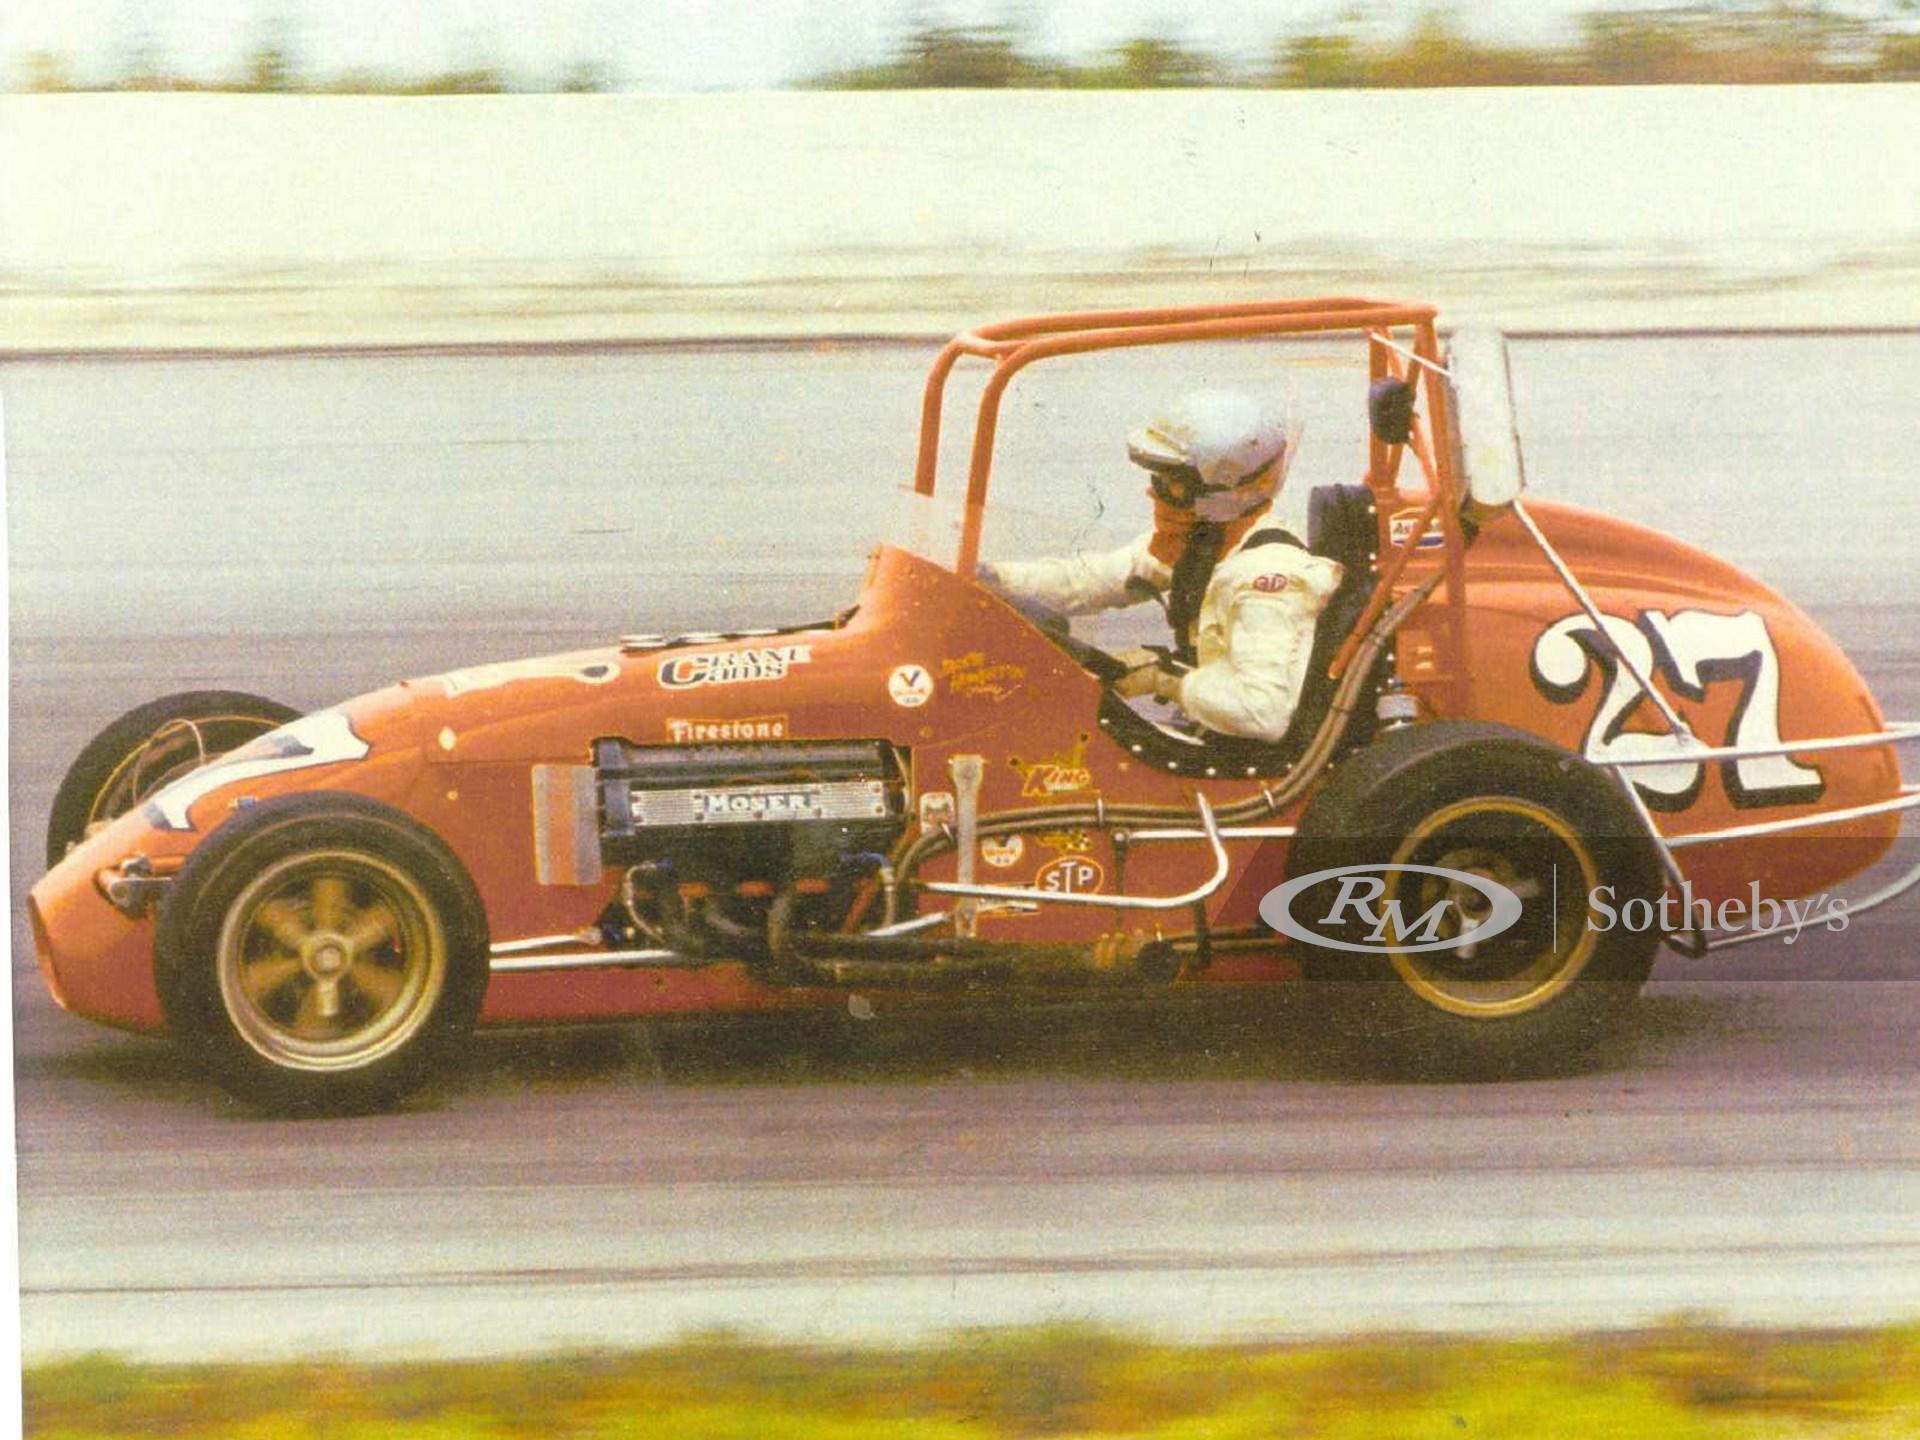 1972 Grant King Sprint Car